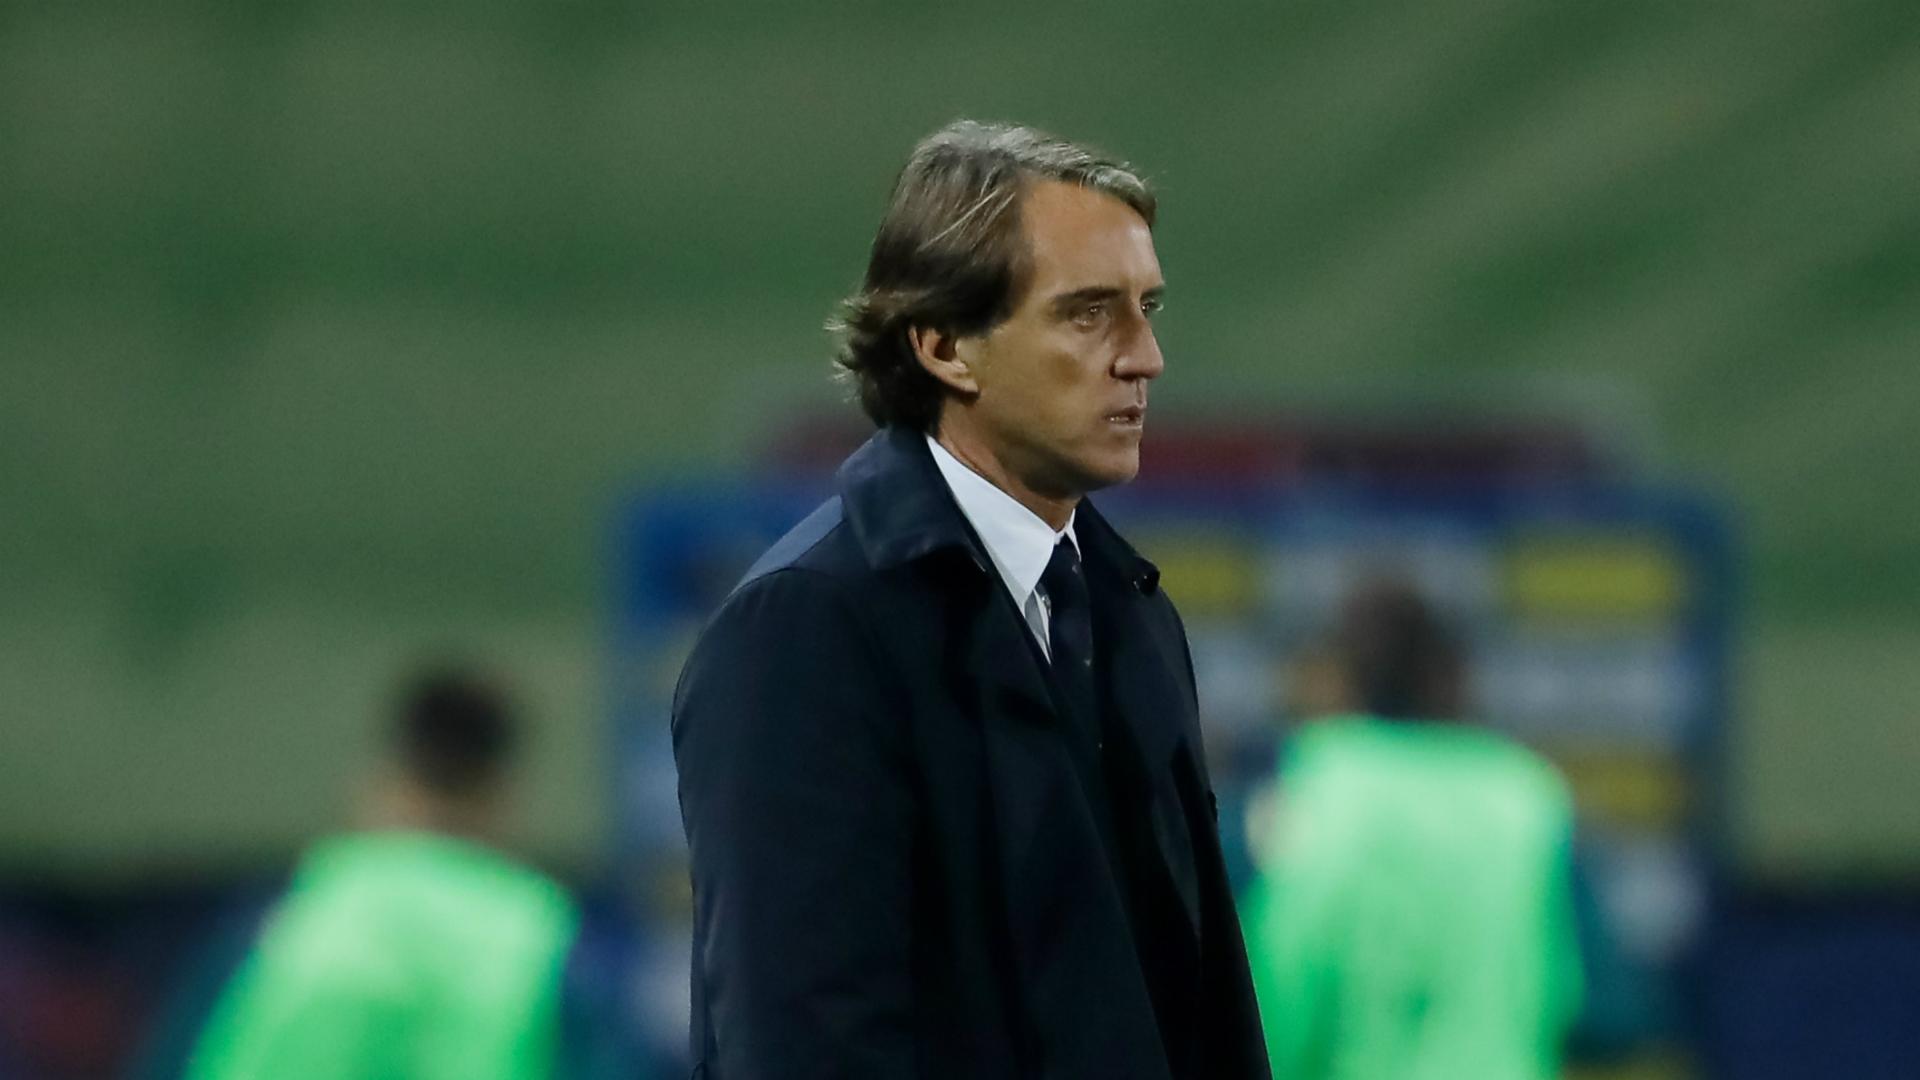 Italy boss Mancini faces 'big problem' selecting Euro 2020 squad